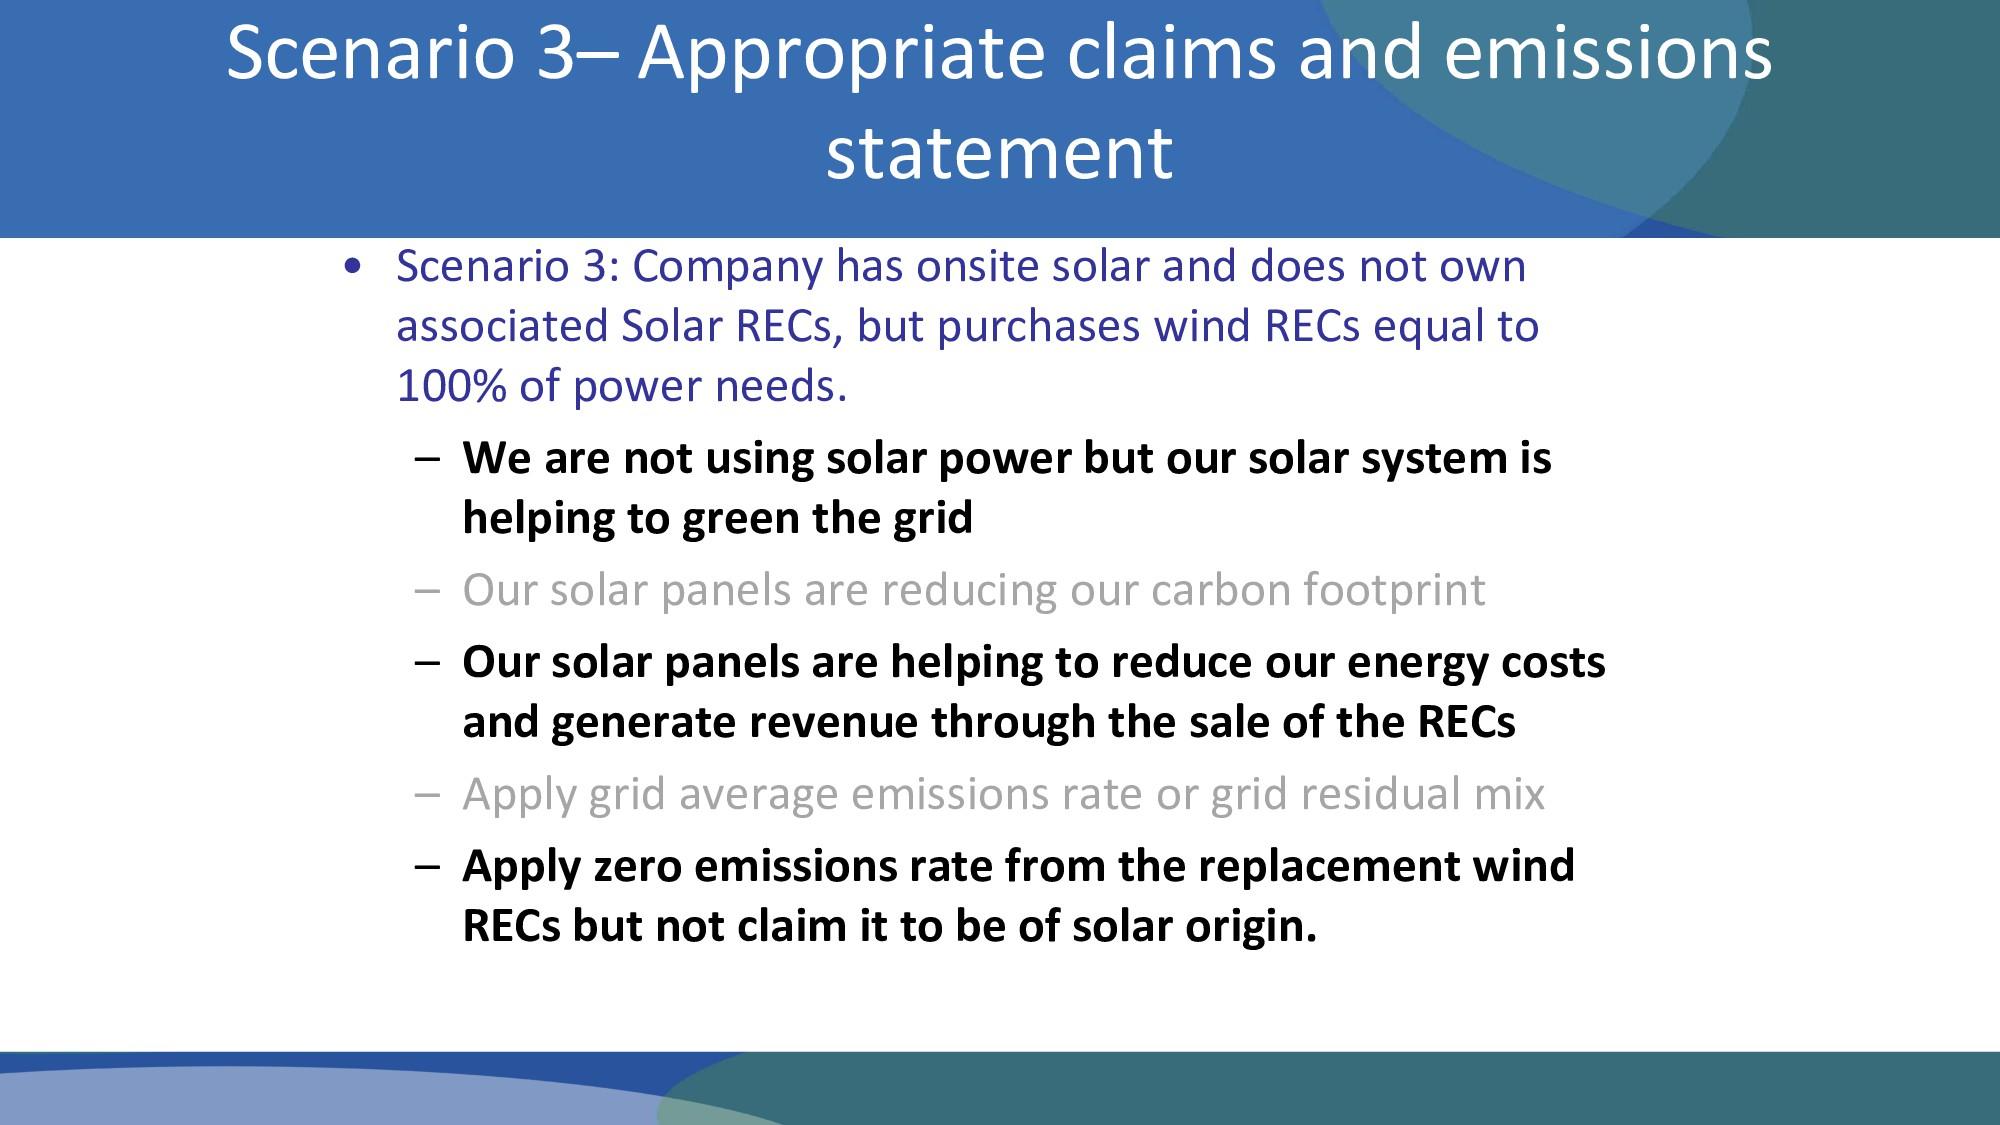 • Scenario 3: Company has onsite solar and does...